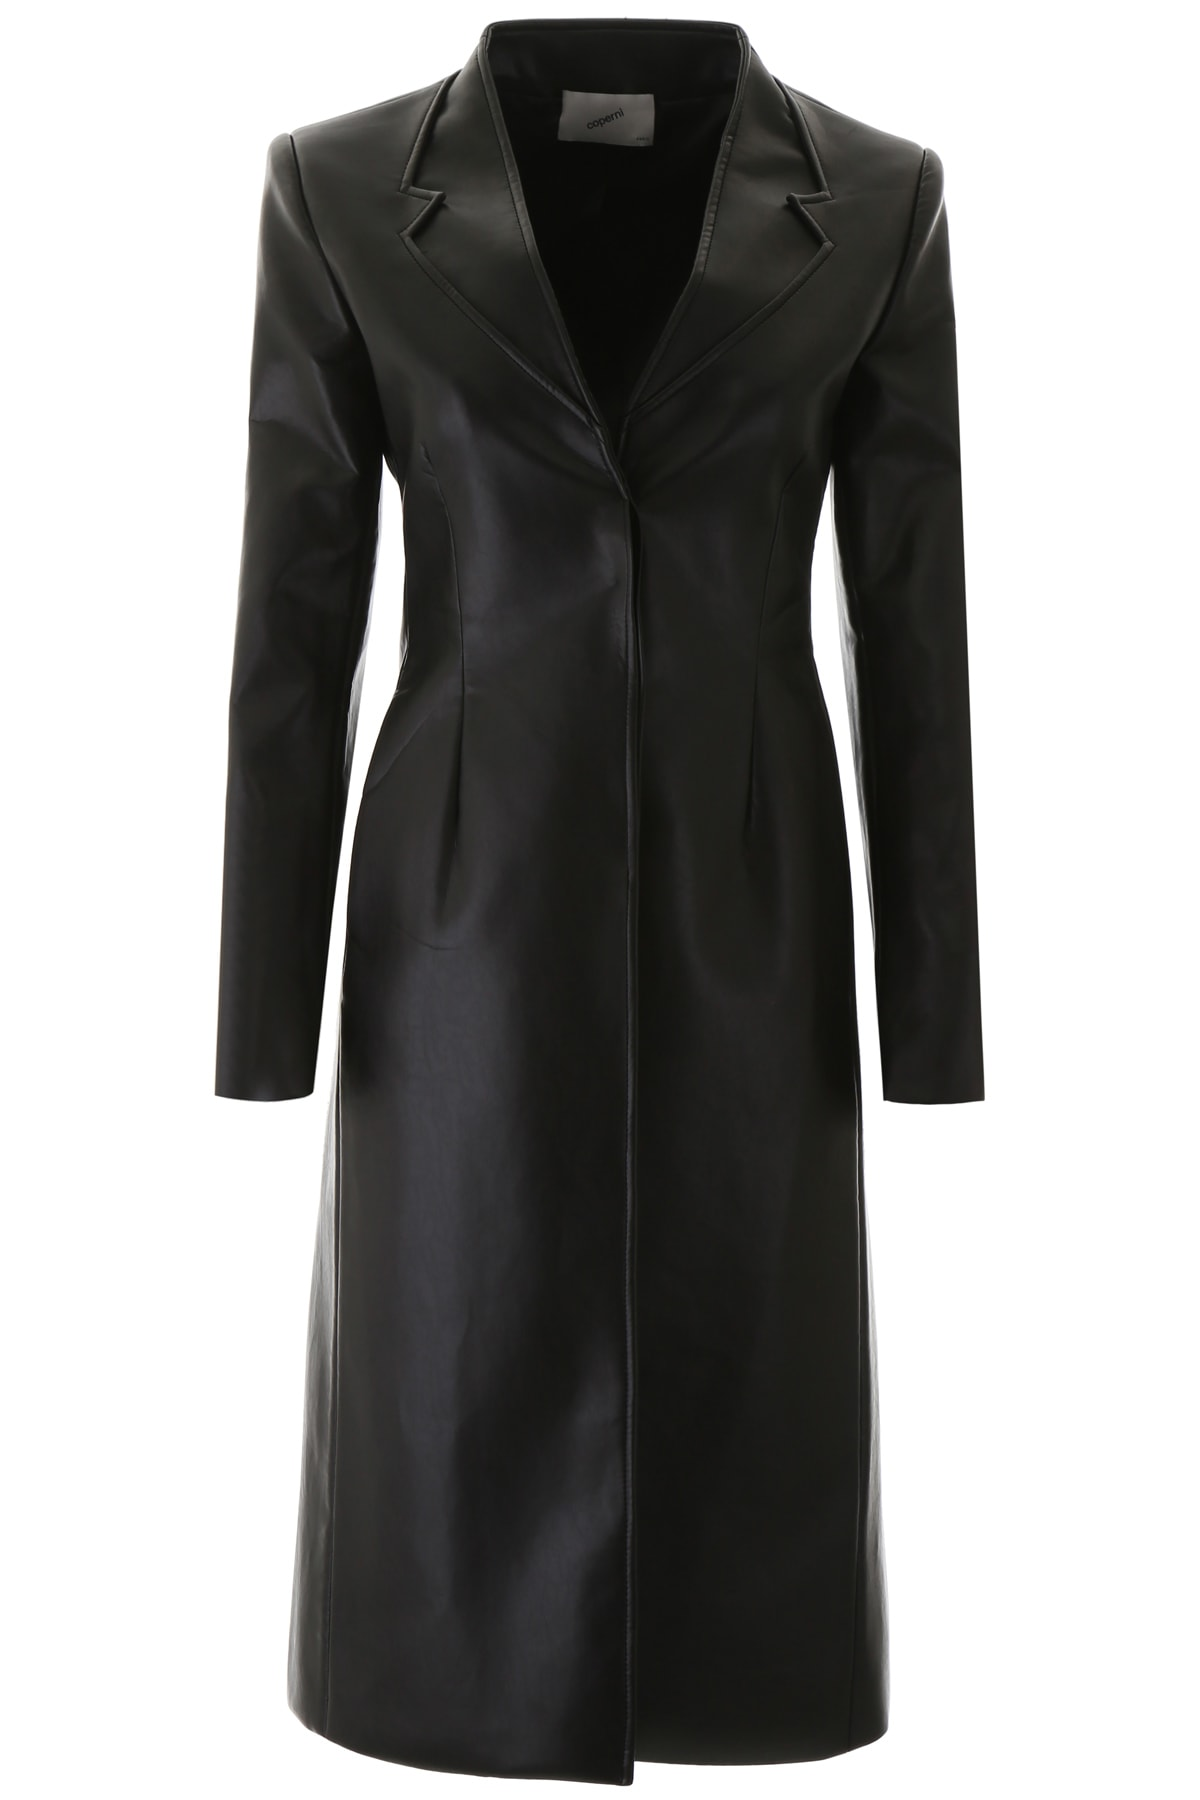 Coperni Leather Coat